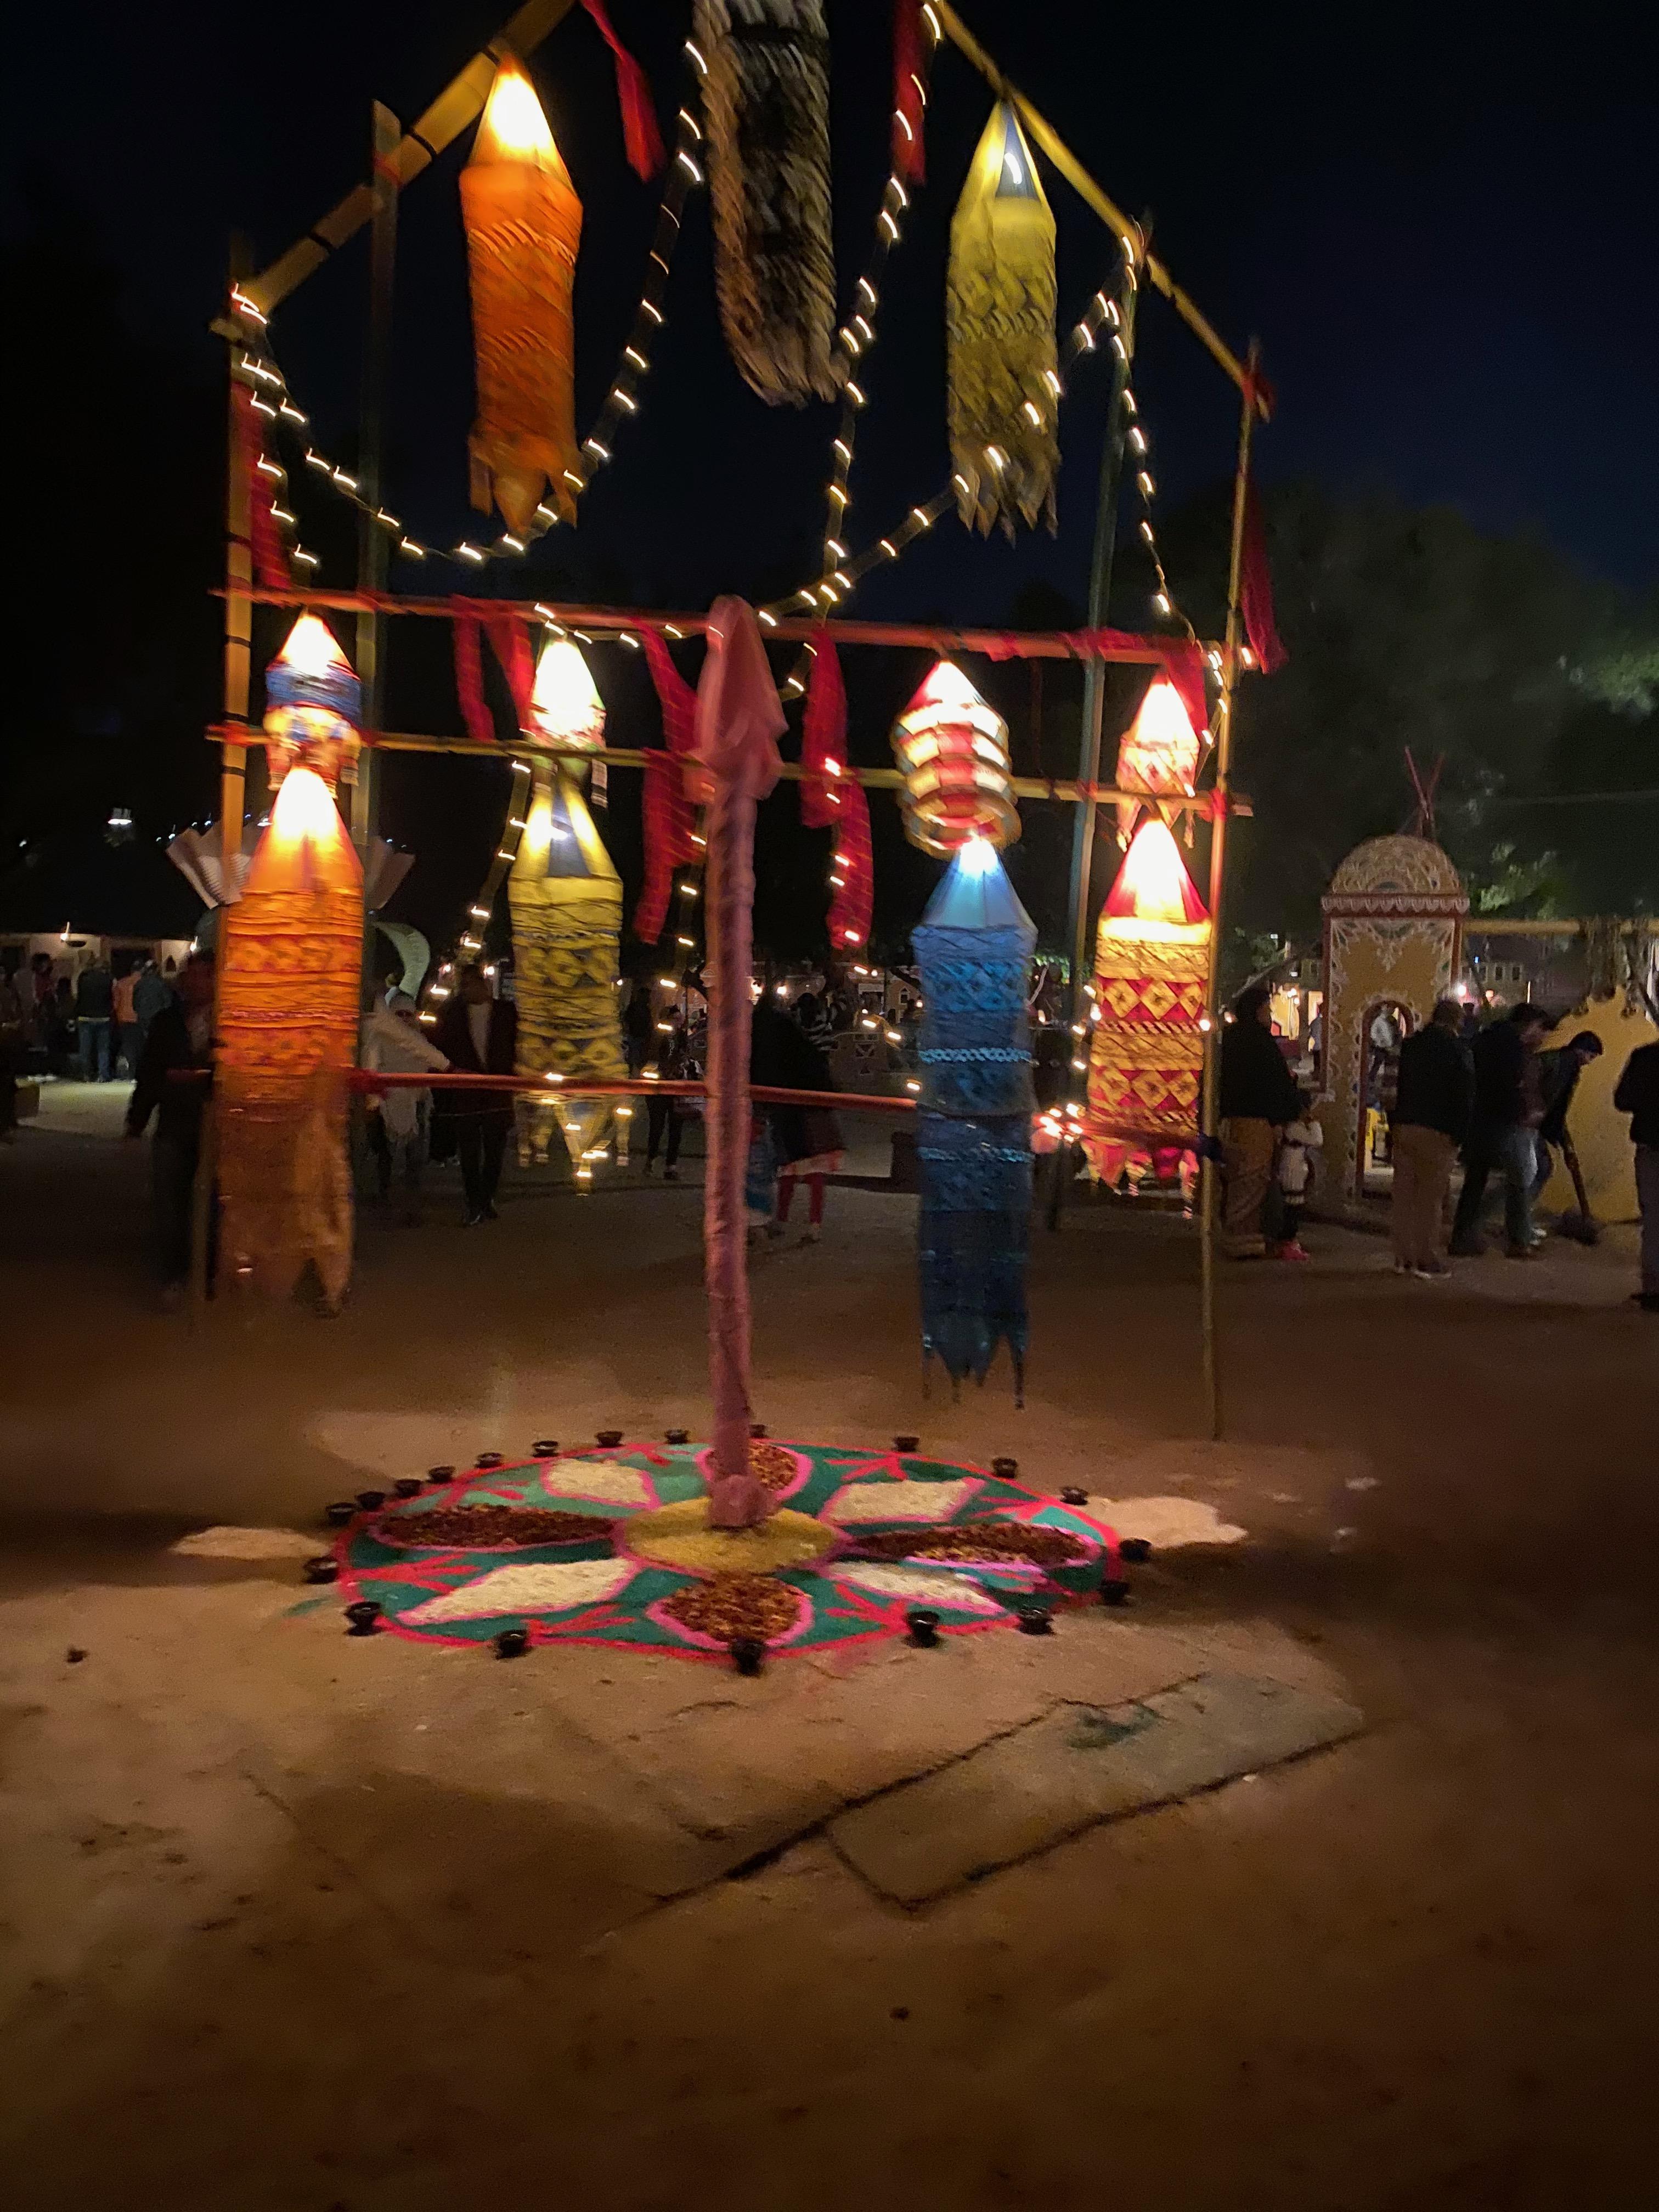 Festive set up at Chokhi Dhani Village